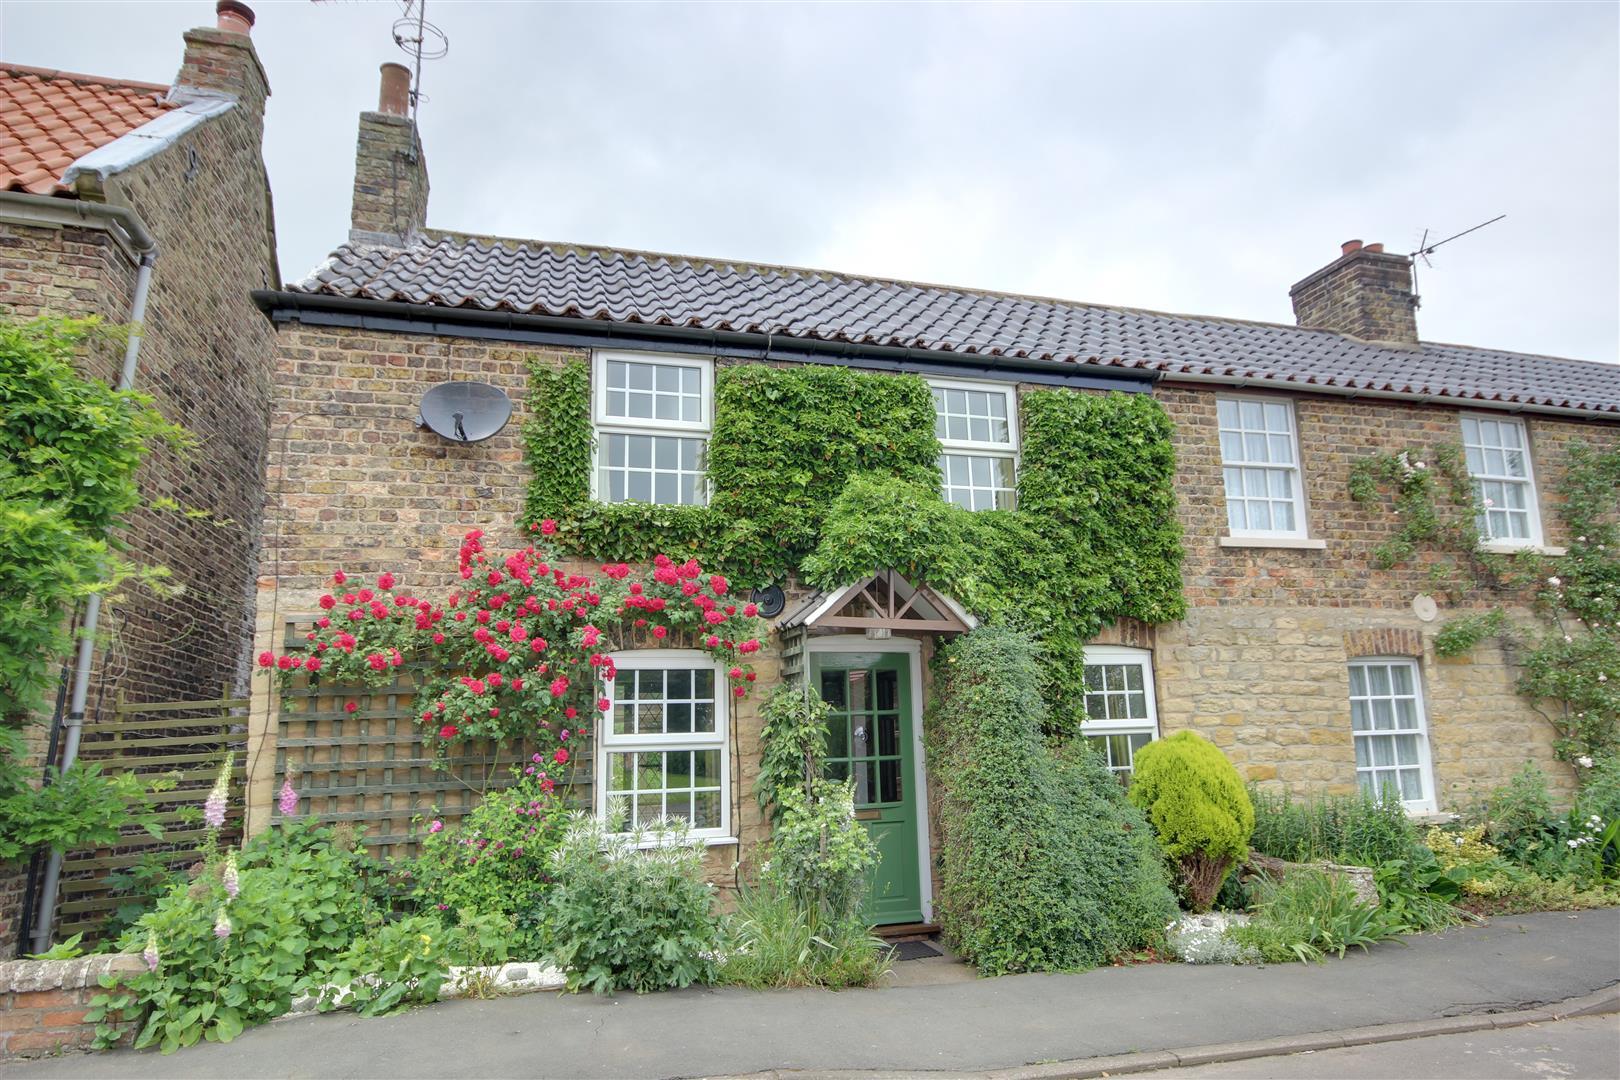 Foxglove Cottage, 8 Main Street, Broomfleet, Brough, Foxglove Cottage, 8, HU15 1RJ